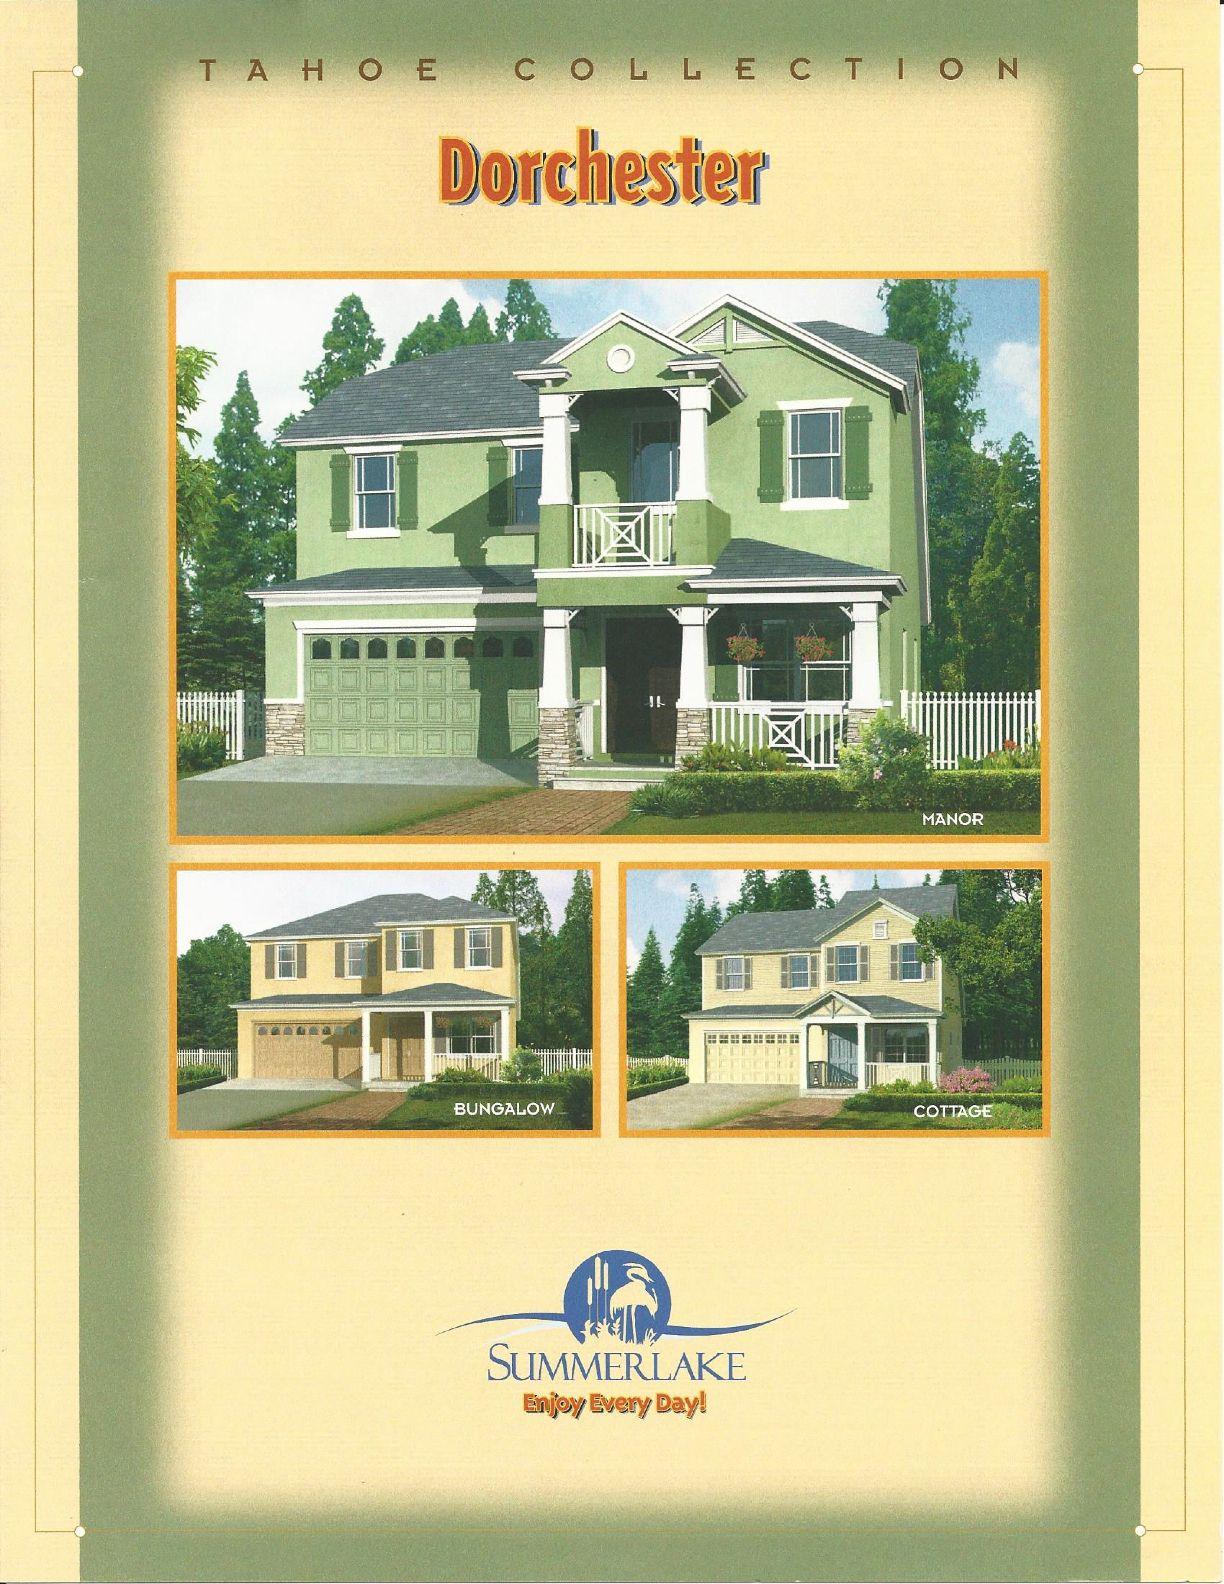 summerlake center line homes tahoe collection dorchester model in